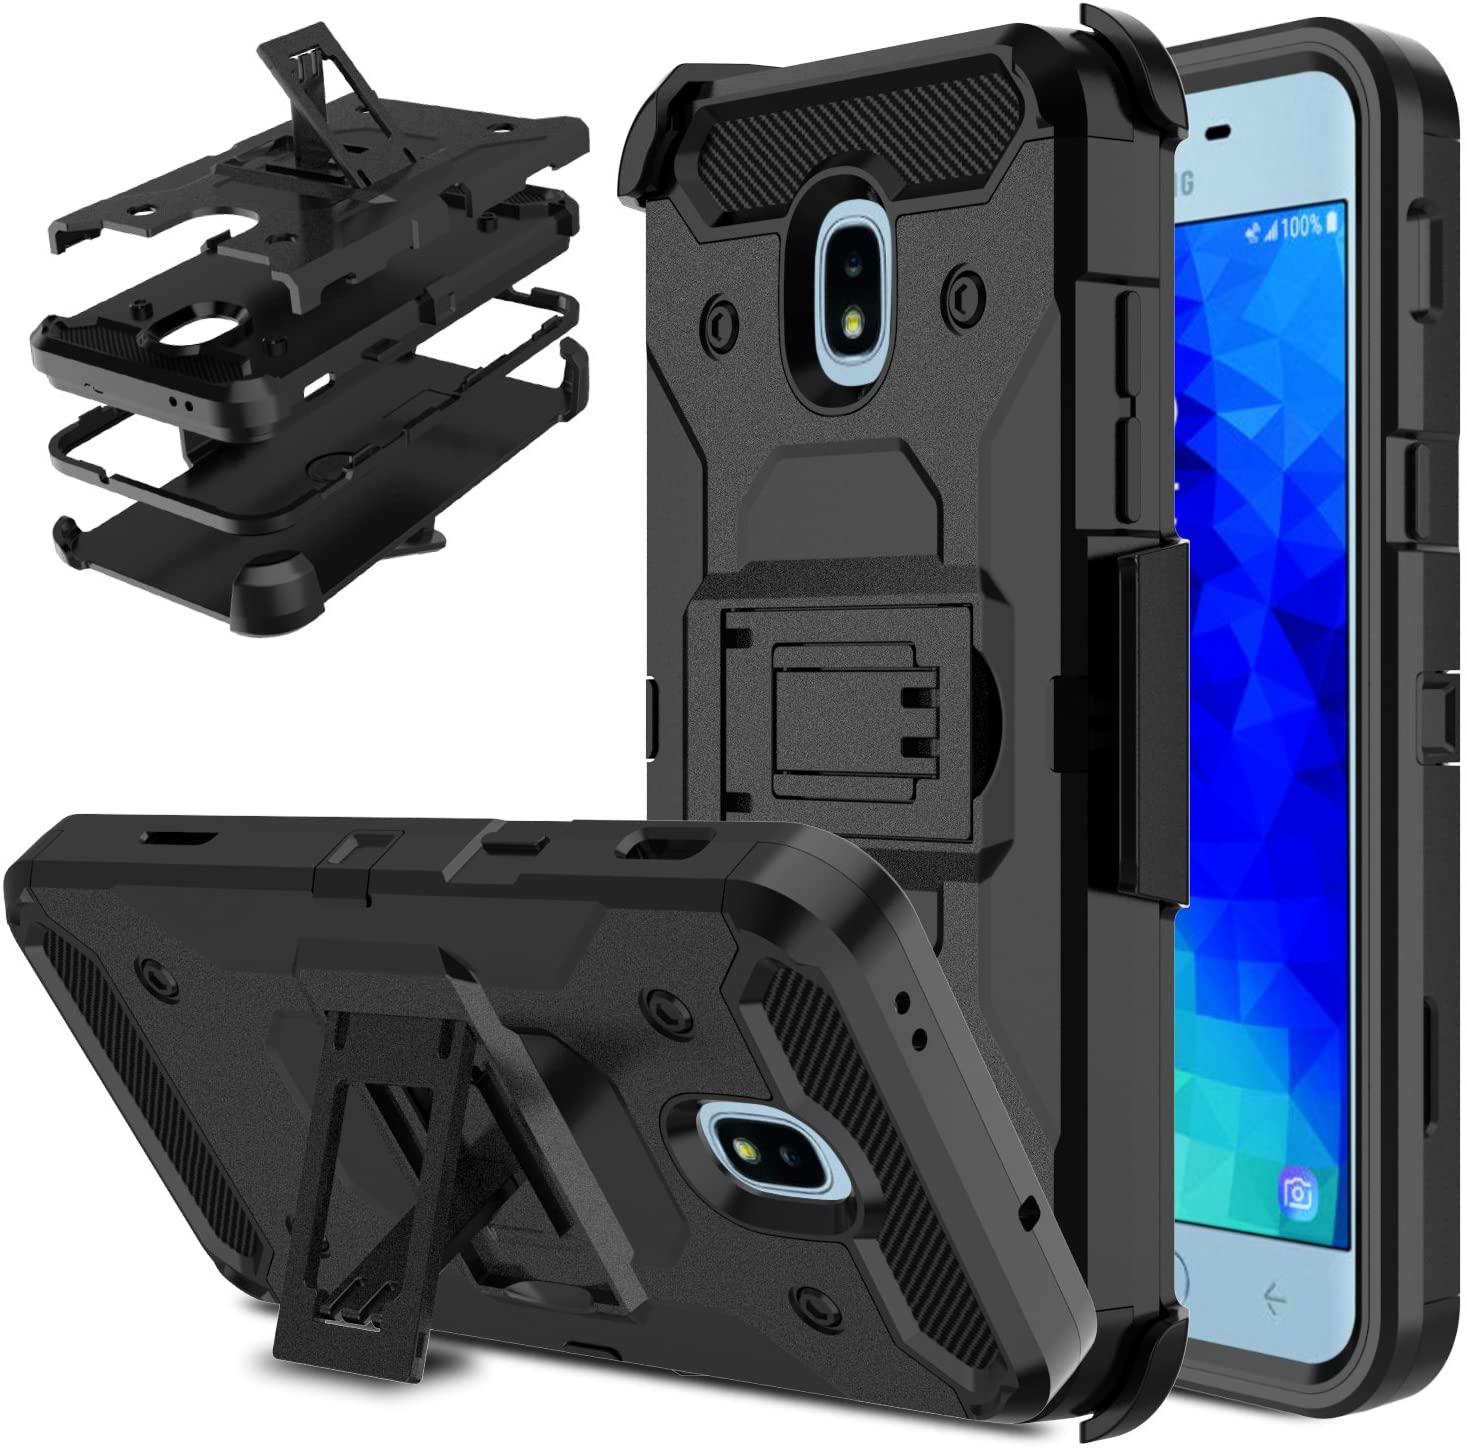 DONWELL Galaxy J3 2018 Case J3 V 3rd Gen Phone Case Shockproof Heavy Duty Protective Cover with Kickstand Belt Clip Holster Compatible for Samsung Galaxy J3 Star / J3 Orbit / J337A J337V (Black)